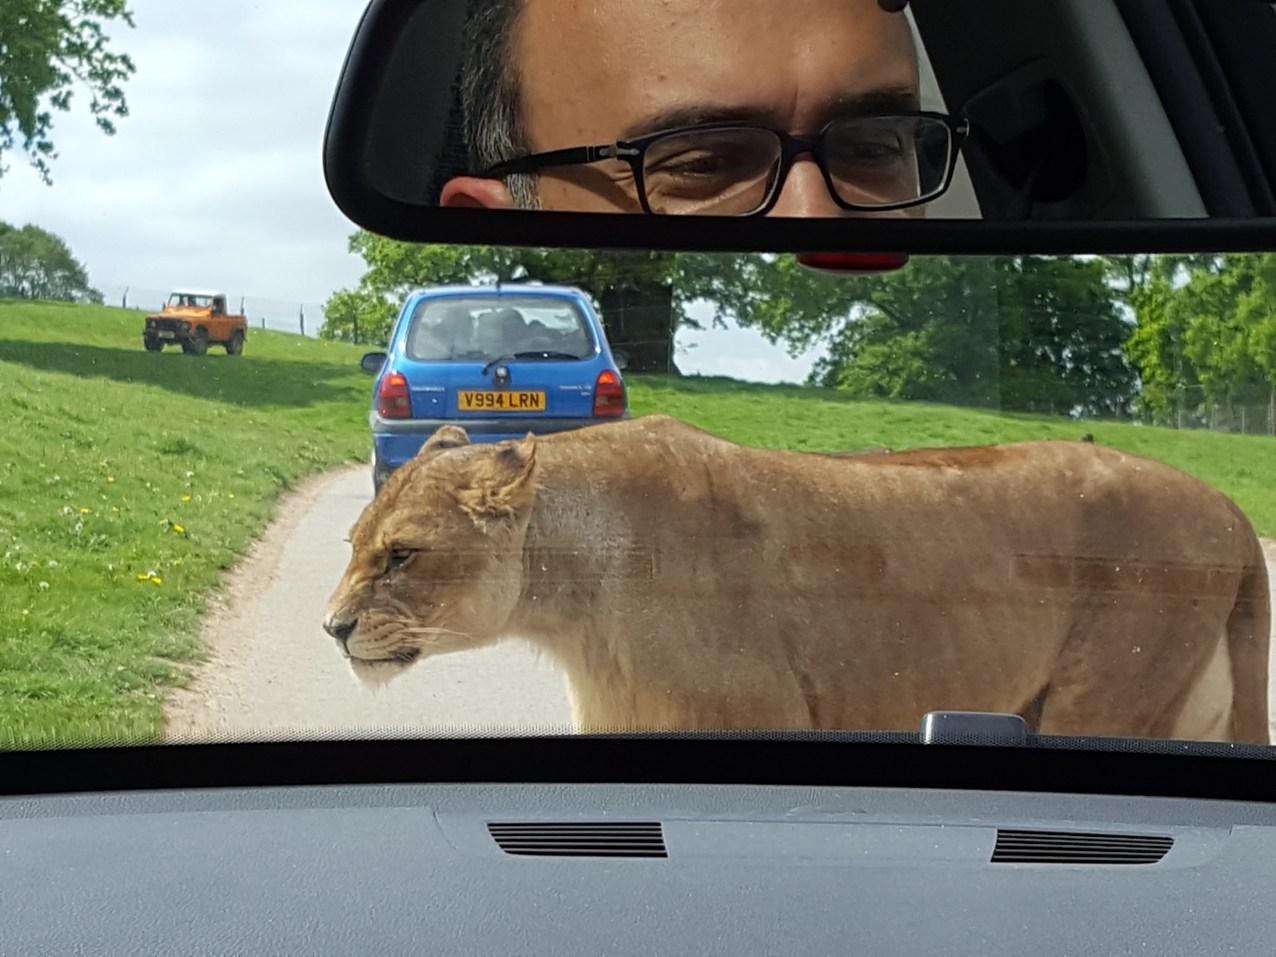 Best day trips from London: Woburn safari